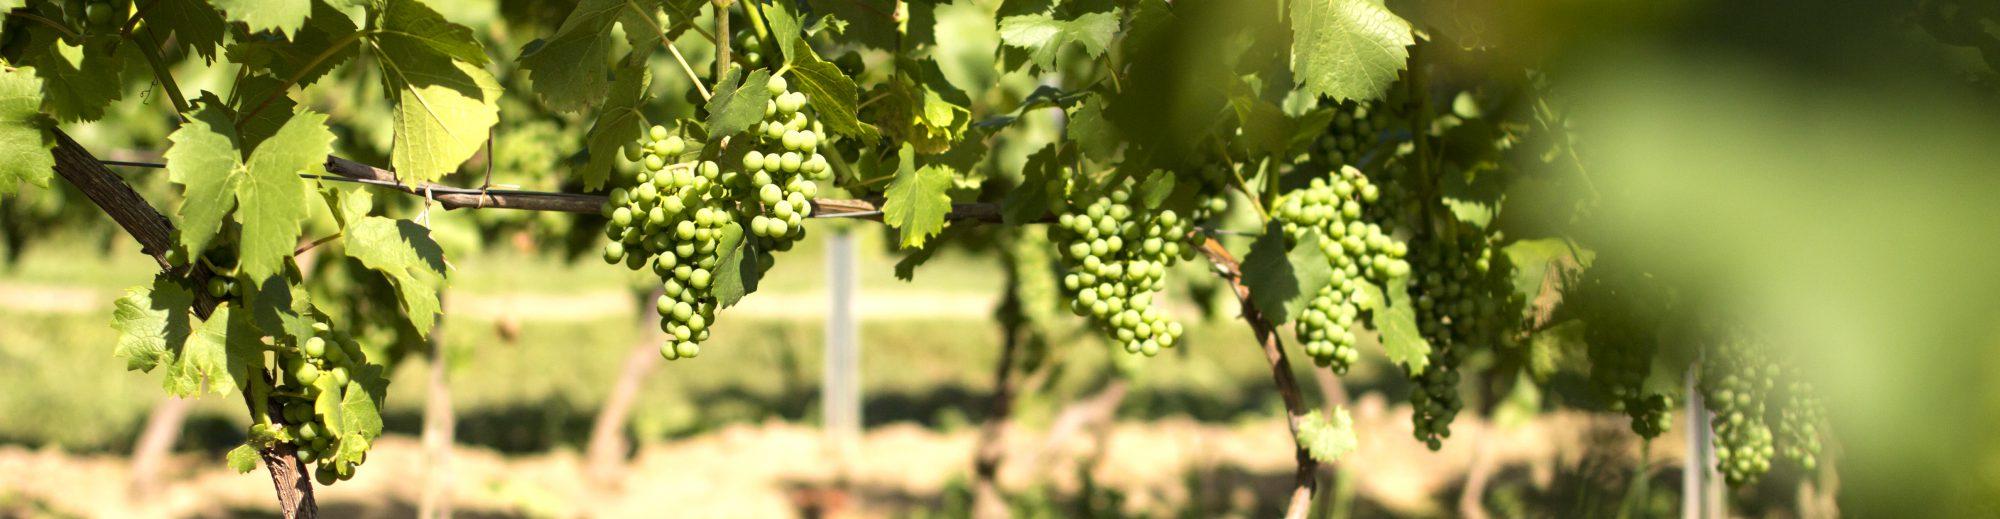 Vanellus – Winnica | Winnica w Jareniówce koło Jasła | Winnica na Podkarpaciu